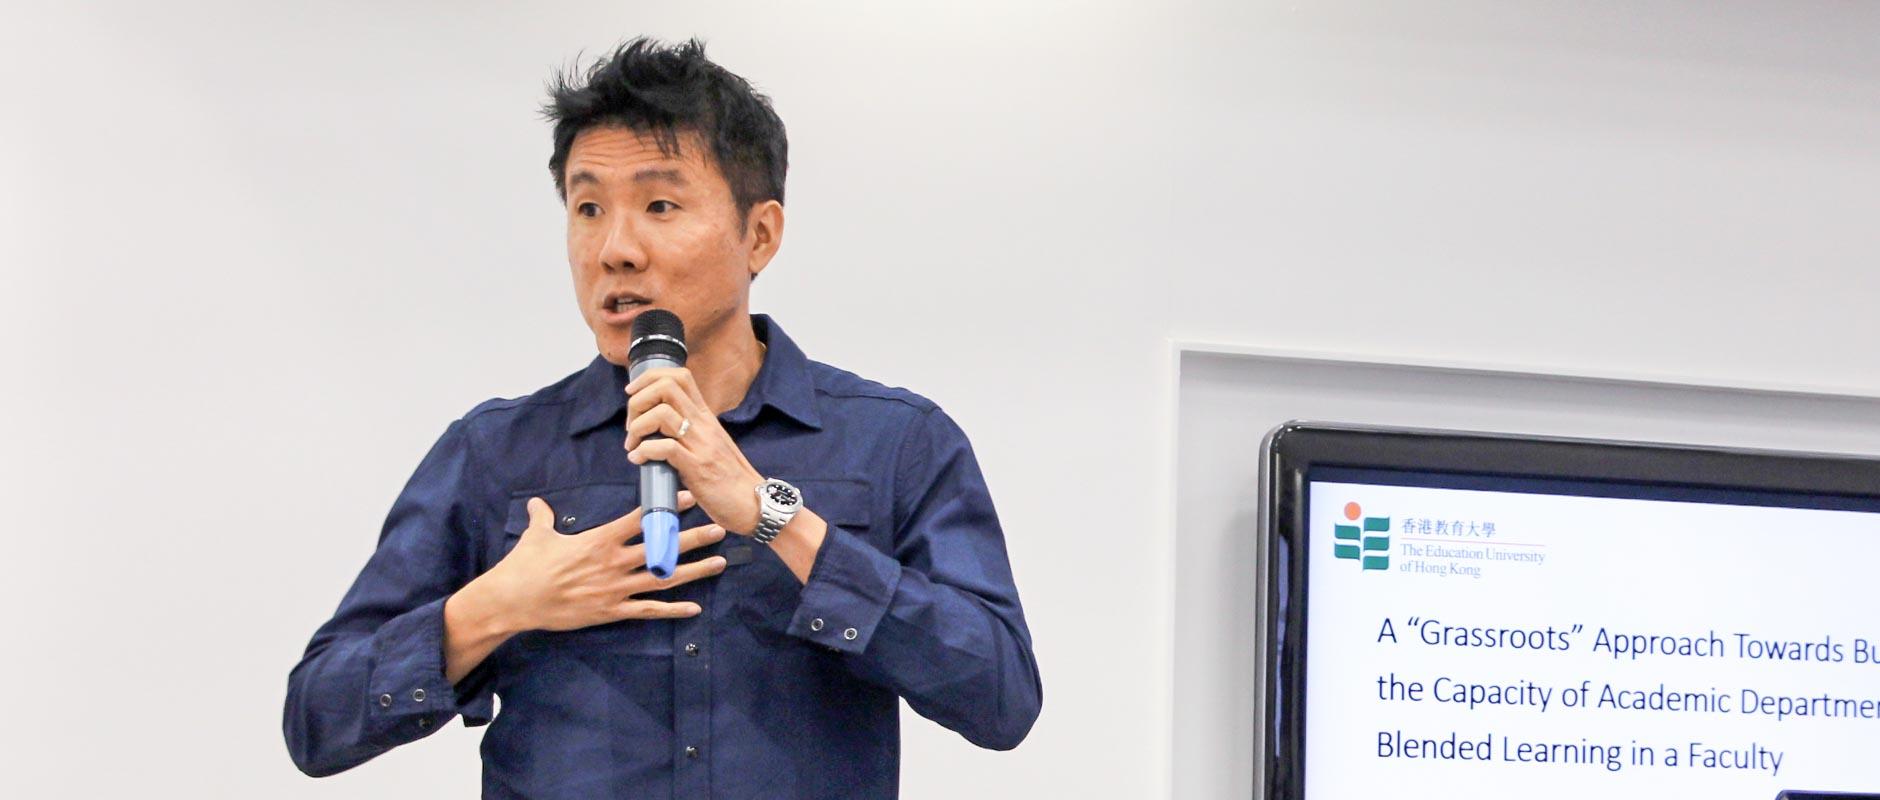 (4) Dr. Lim copy